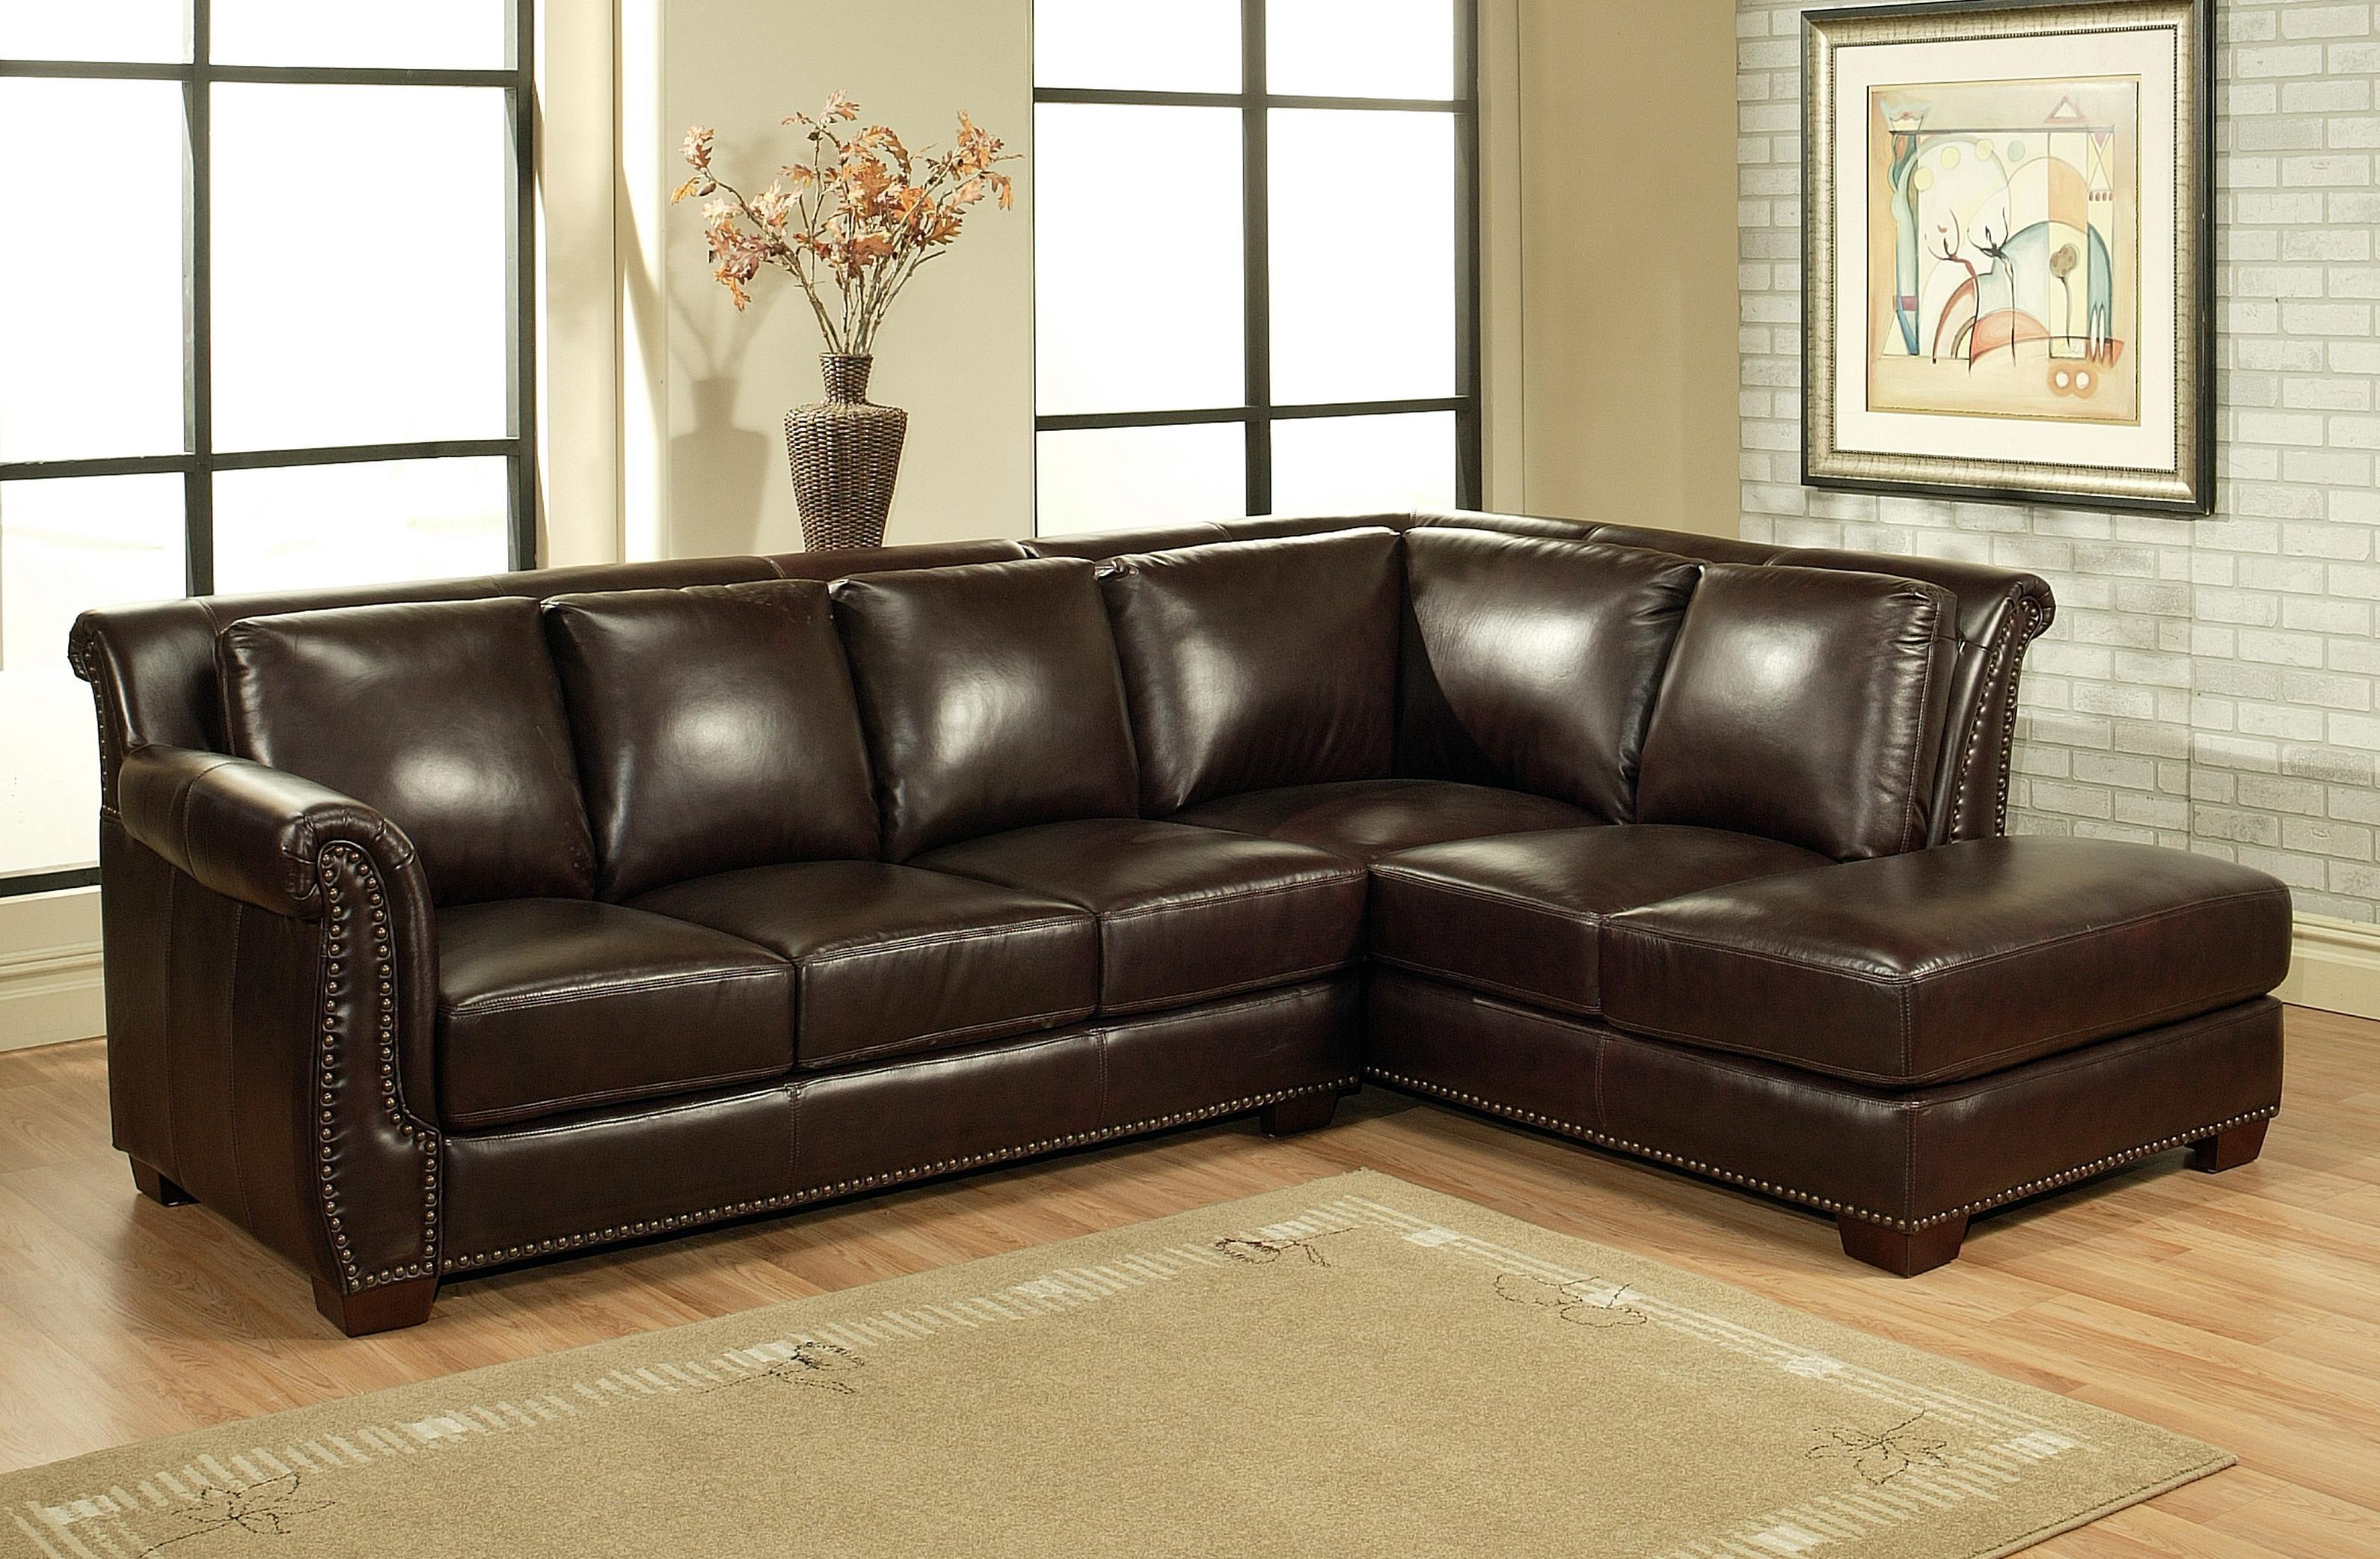 Furniture: Thomasville Furniture Nj | Thomasville Sofa Pertaining To Thomasville Leather Sectionals (Image 8 of 20)